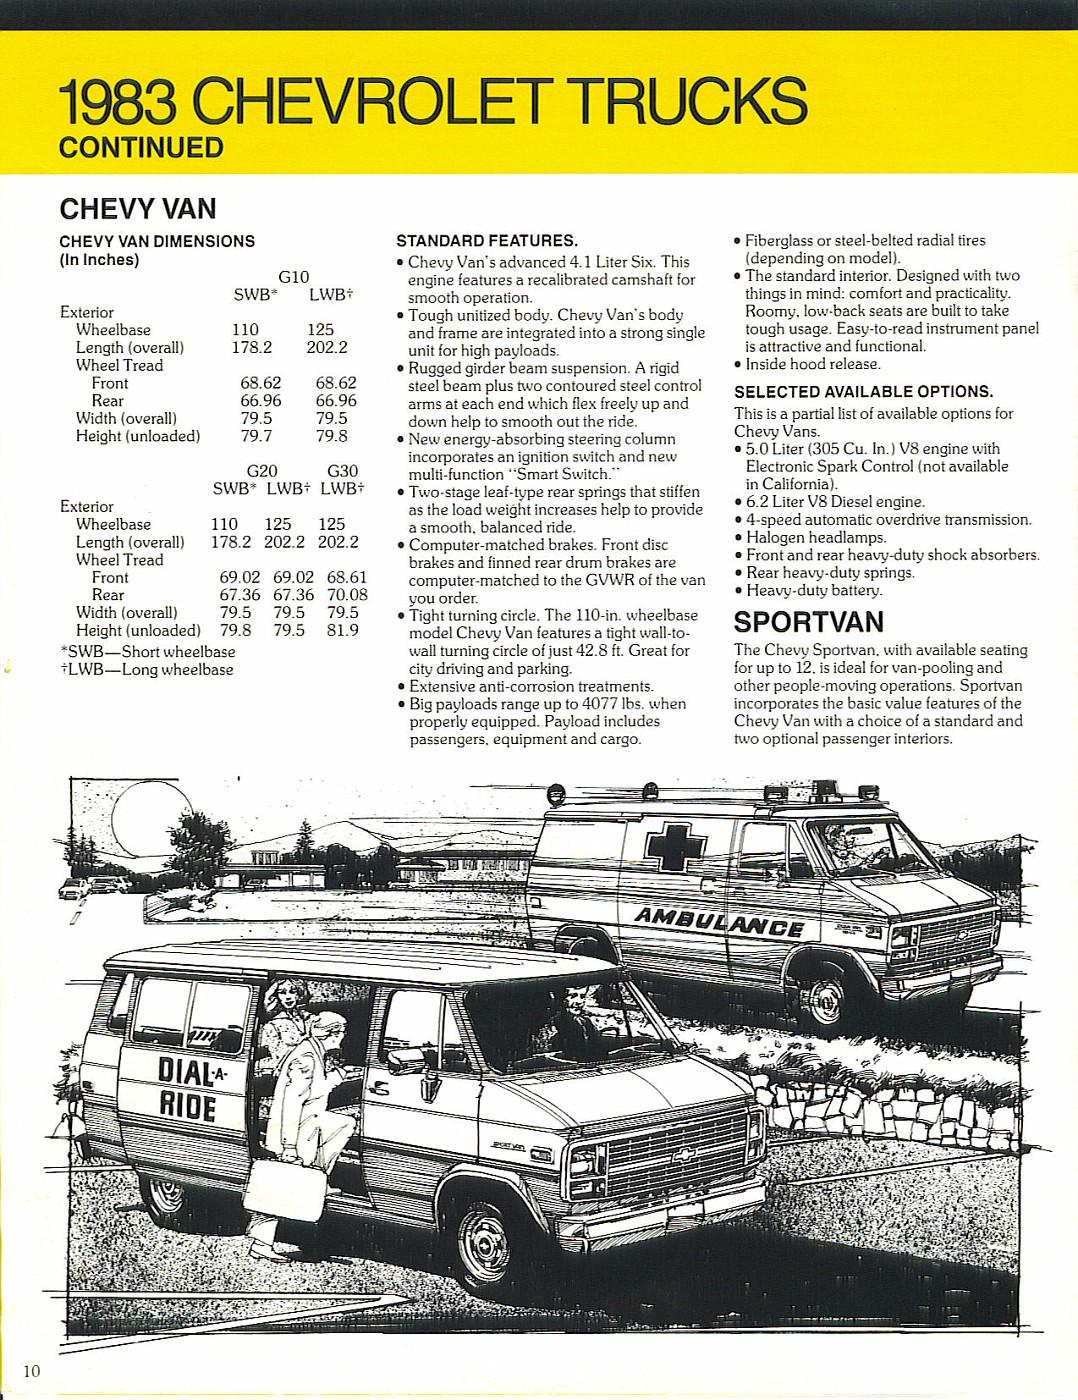 1983Chevrolet10-vi.jpg